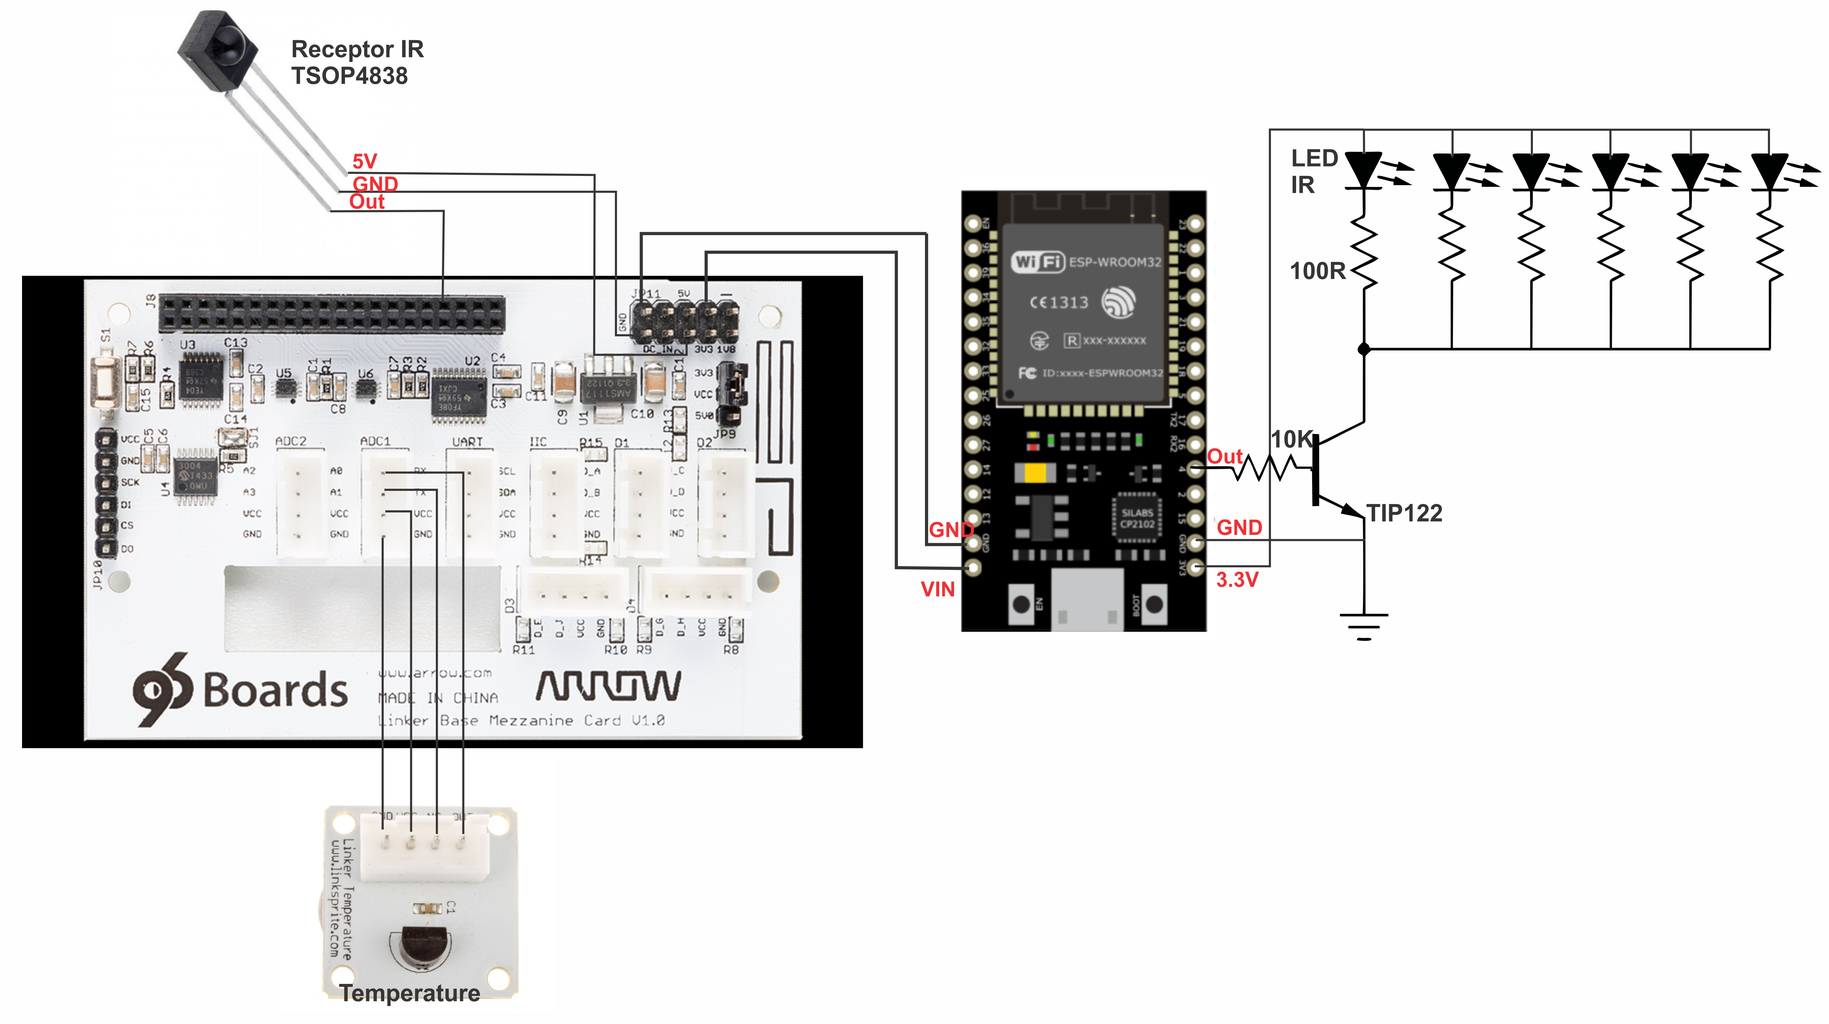 Montagem Da Central (Dragonboard, Mezzanine, Sensor IR TSOP4838, ESP32, Módulo IR 360º)